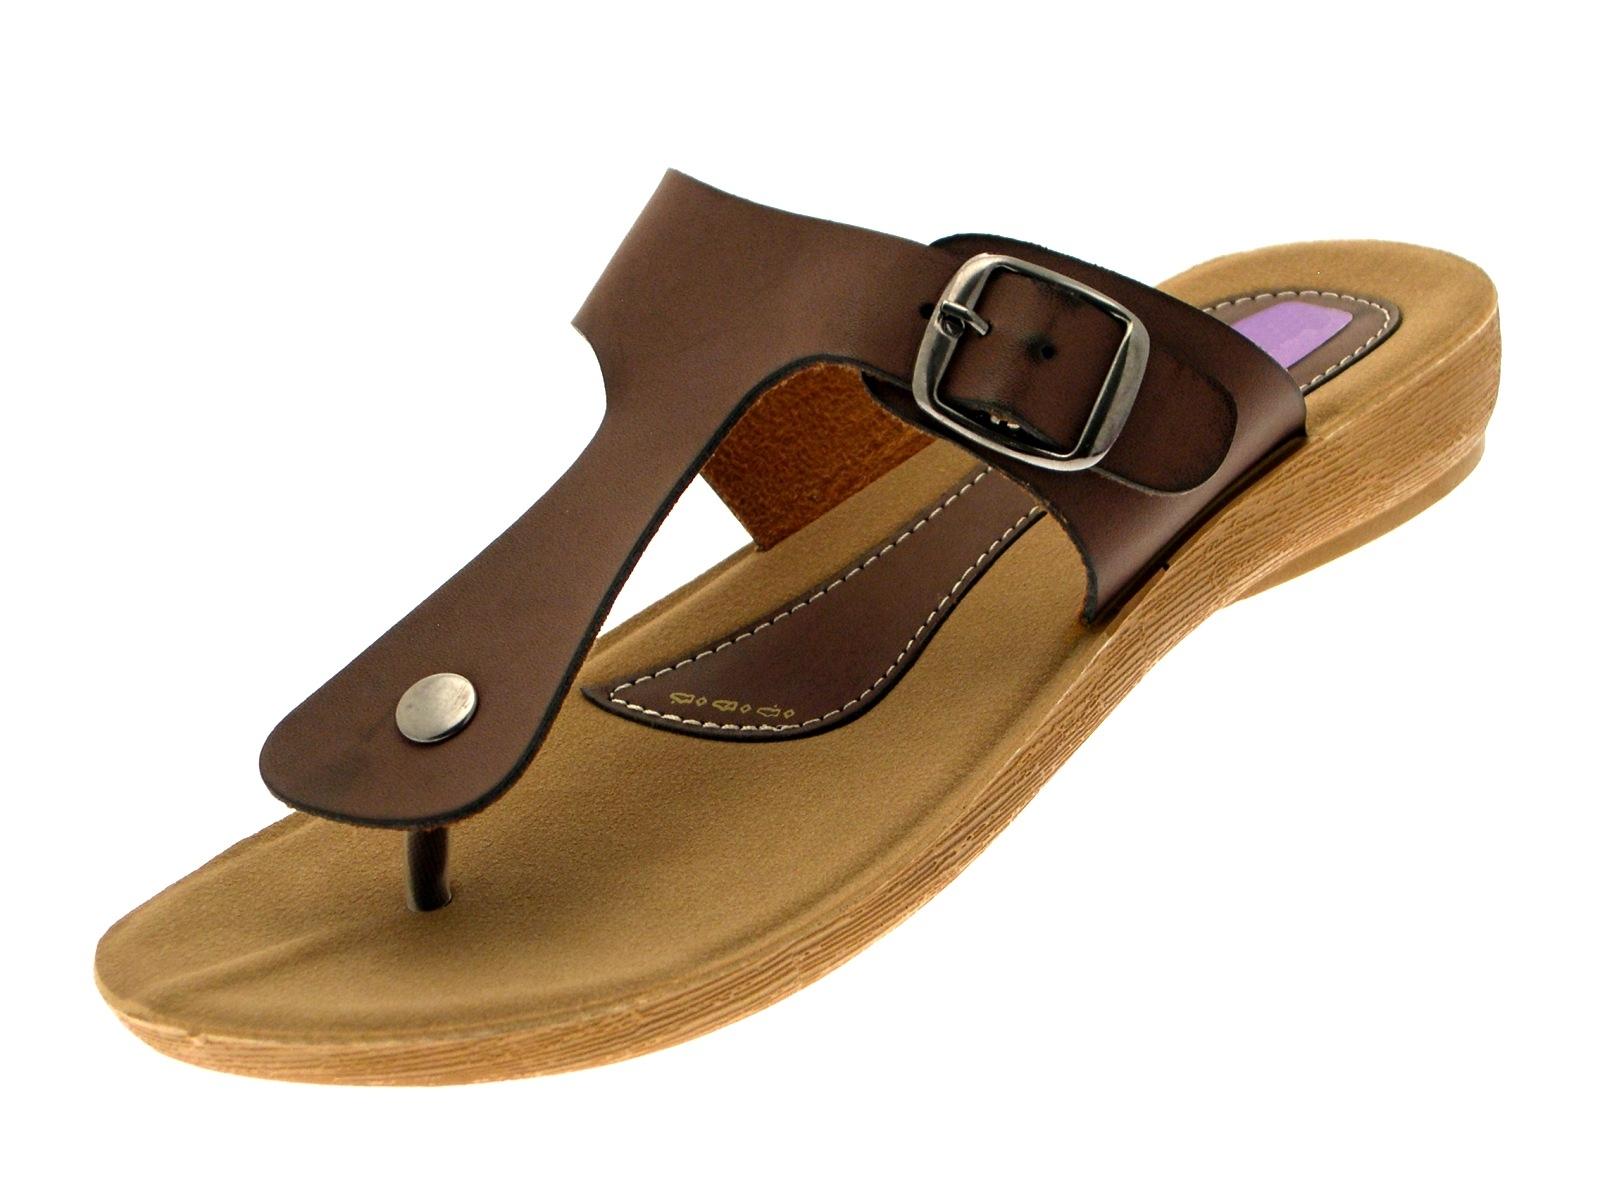 868a409da86 Womens Toe Posts Flip Flops Low Wedges Mules Summer Sandals Ladies ...